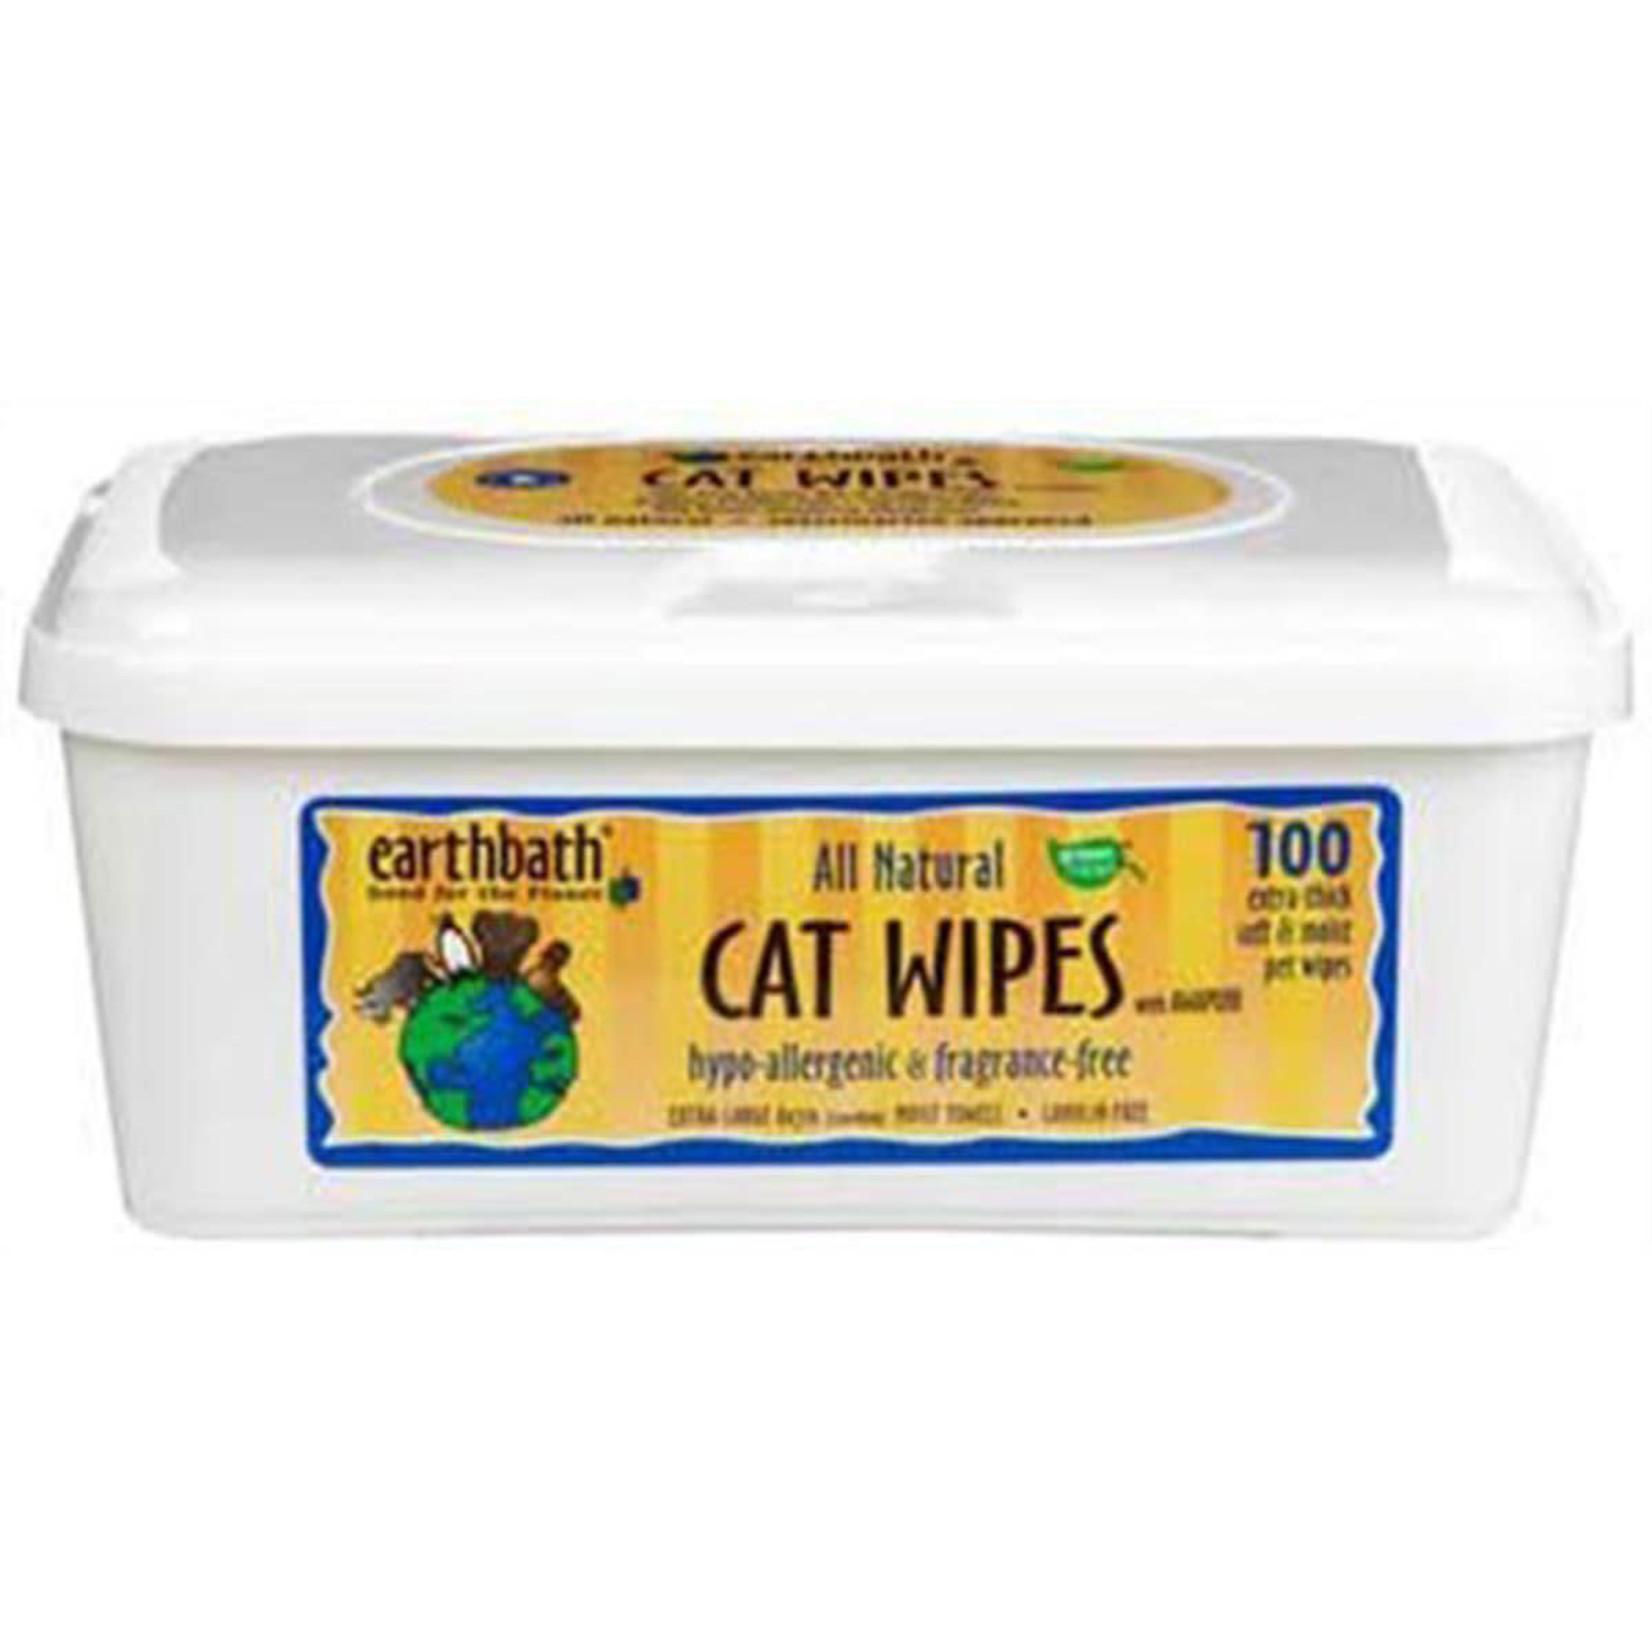 Earth Bath / Shea Pet Earth Bath Cat Wipes Hypoallergenic 100 Count